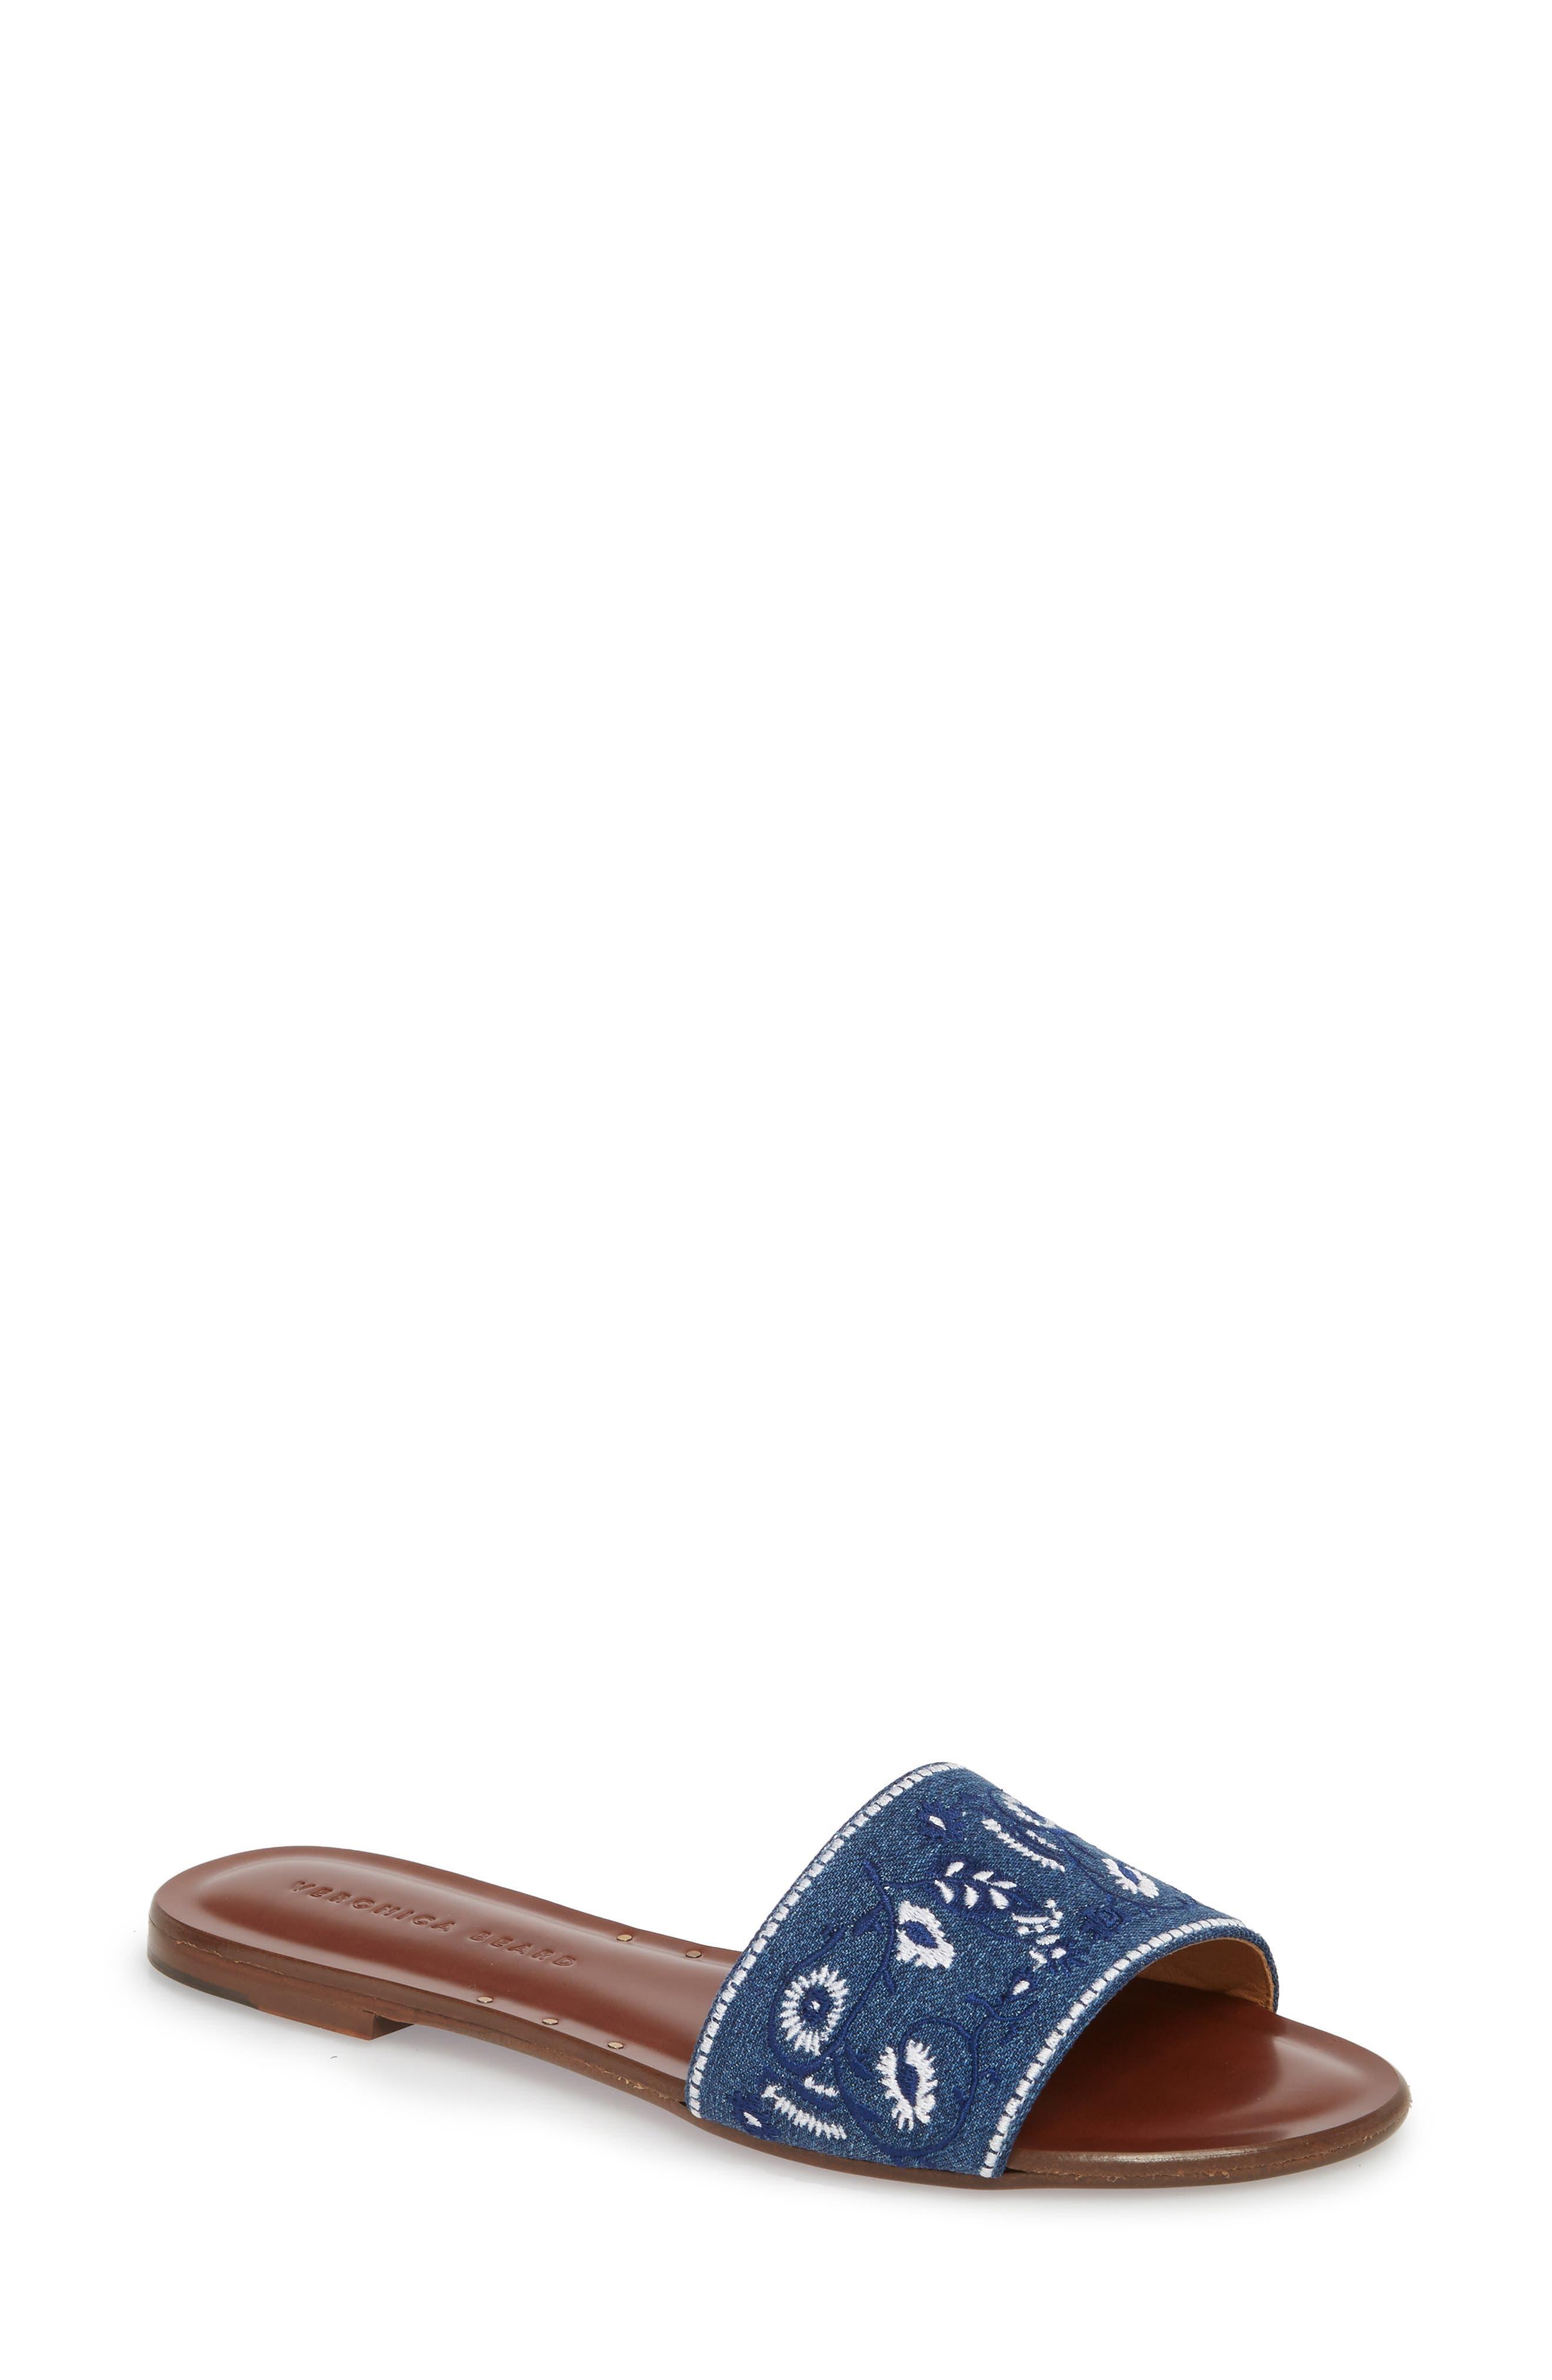 Veronica Beard Flor Embroidered Slide Sandal (Women)